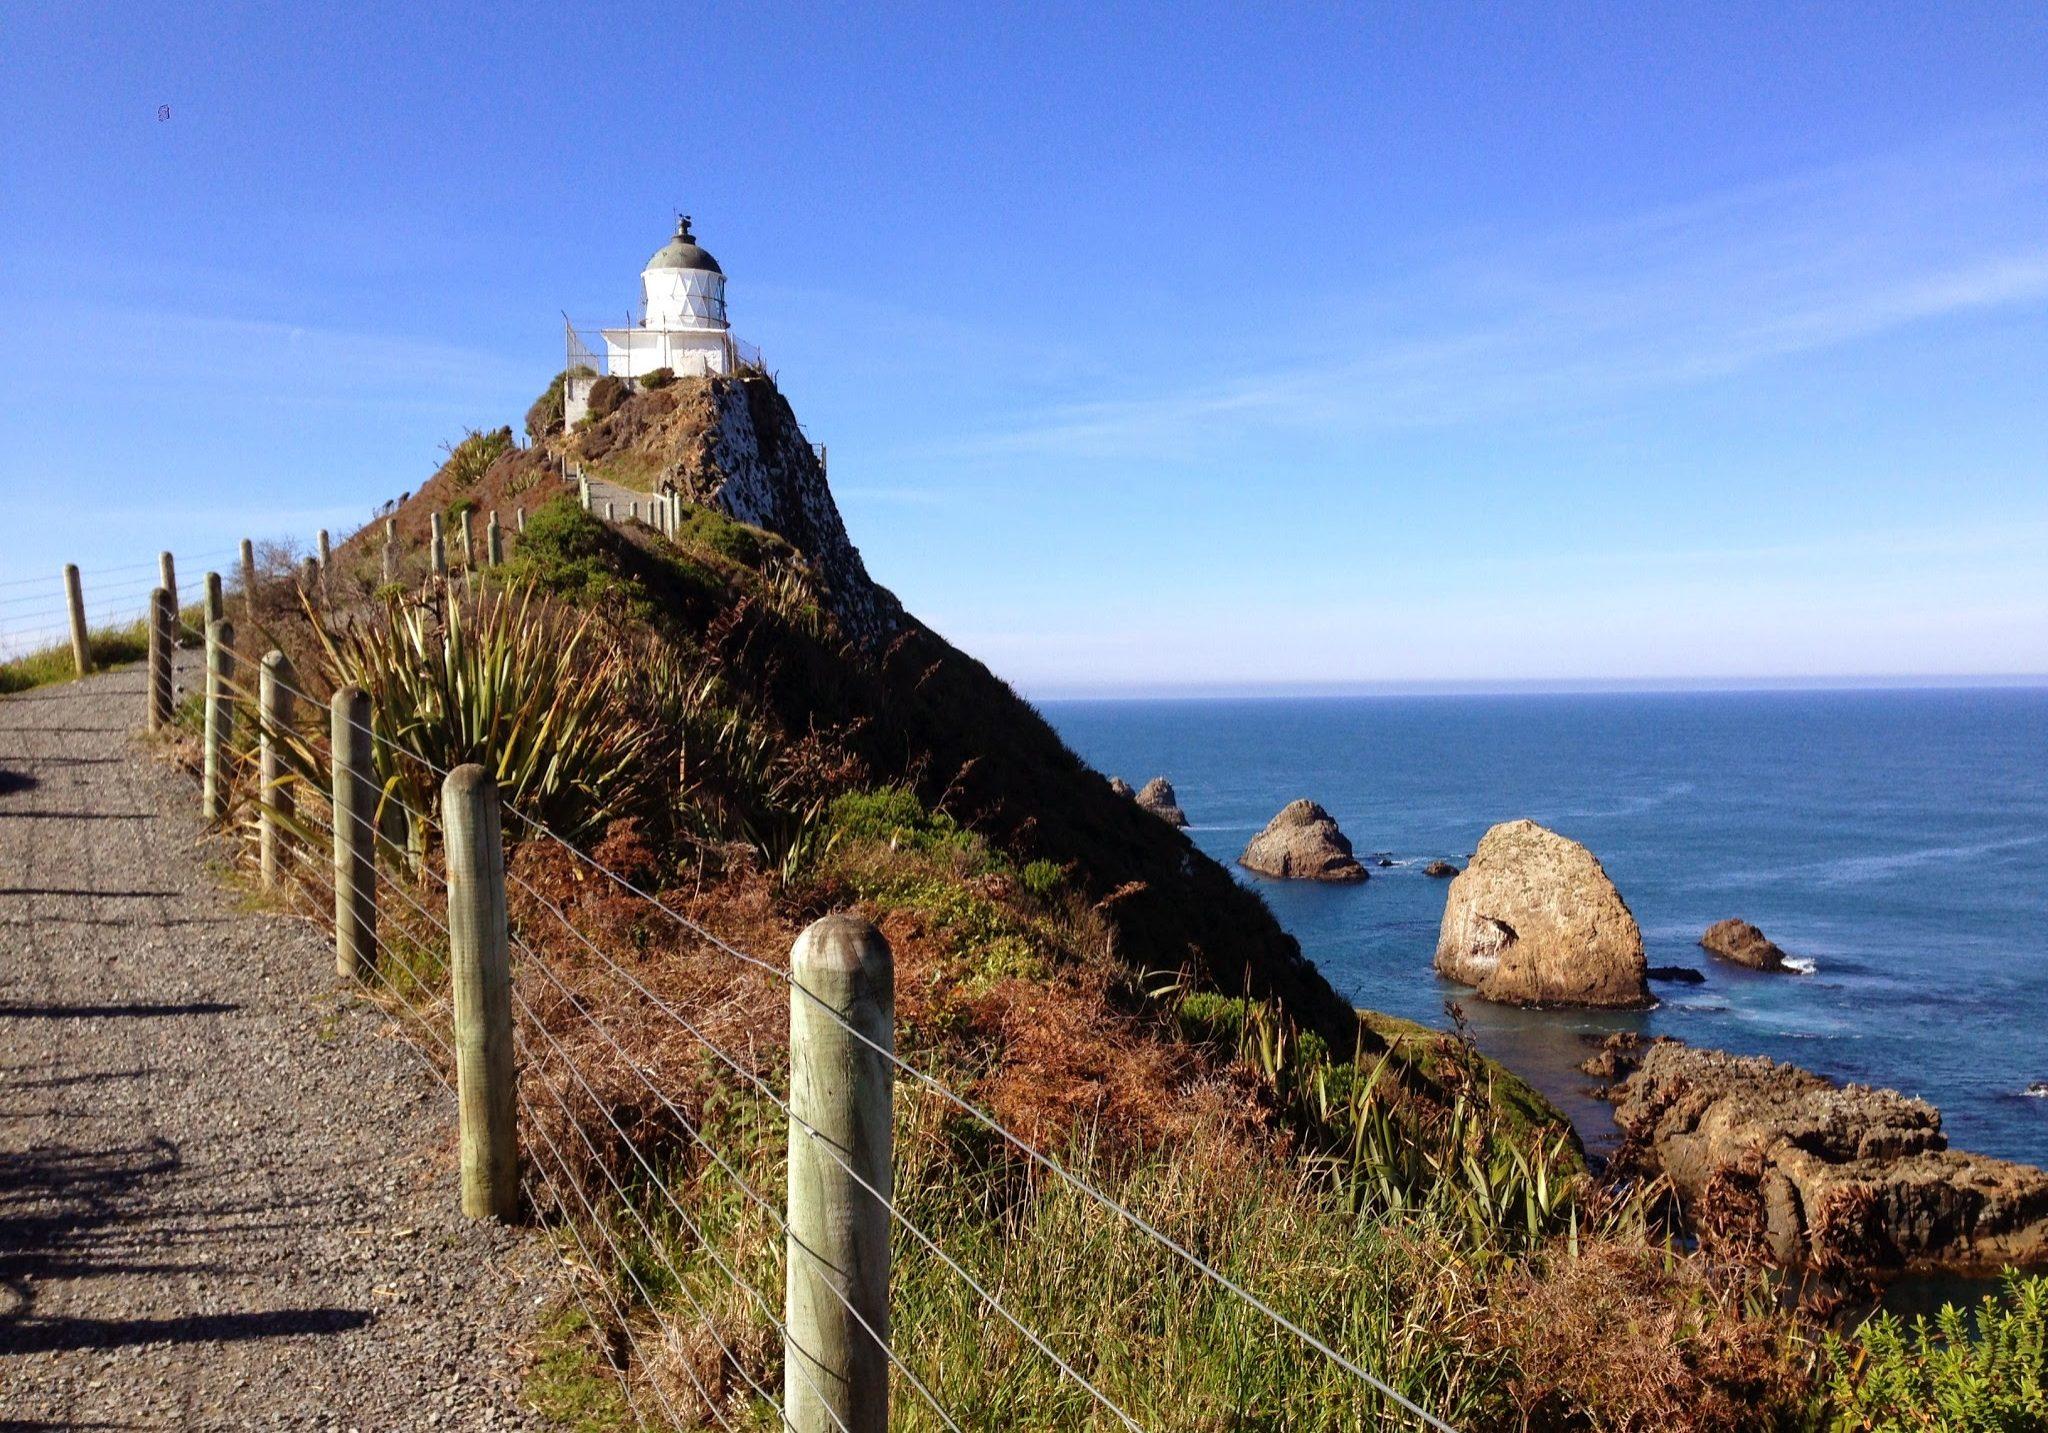 Nugget piont, catlins, the catlins, south coast, south island, new zealand, lighthouse, coastal, coast, coastal walk